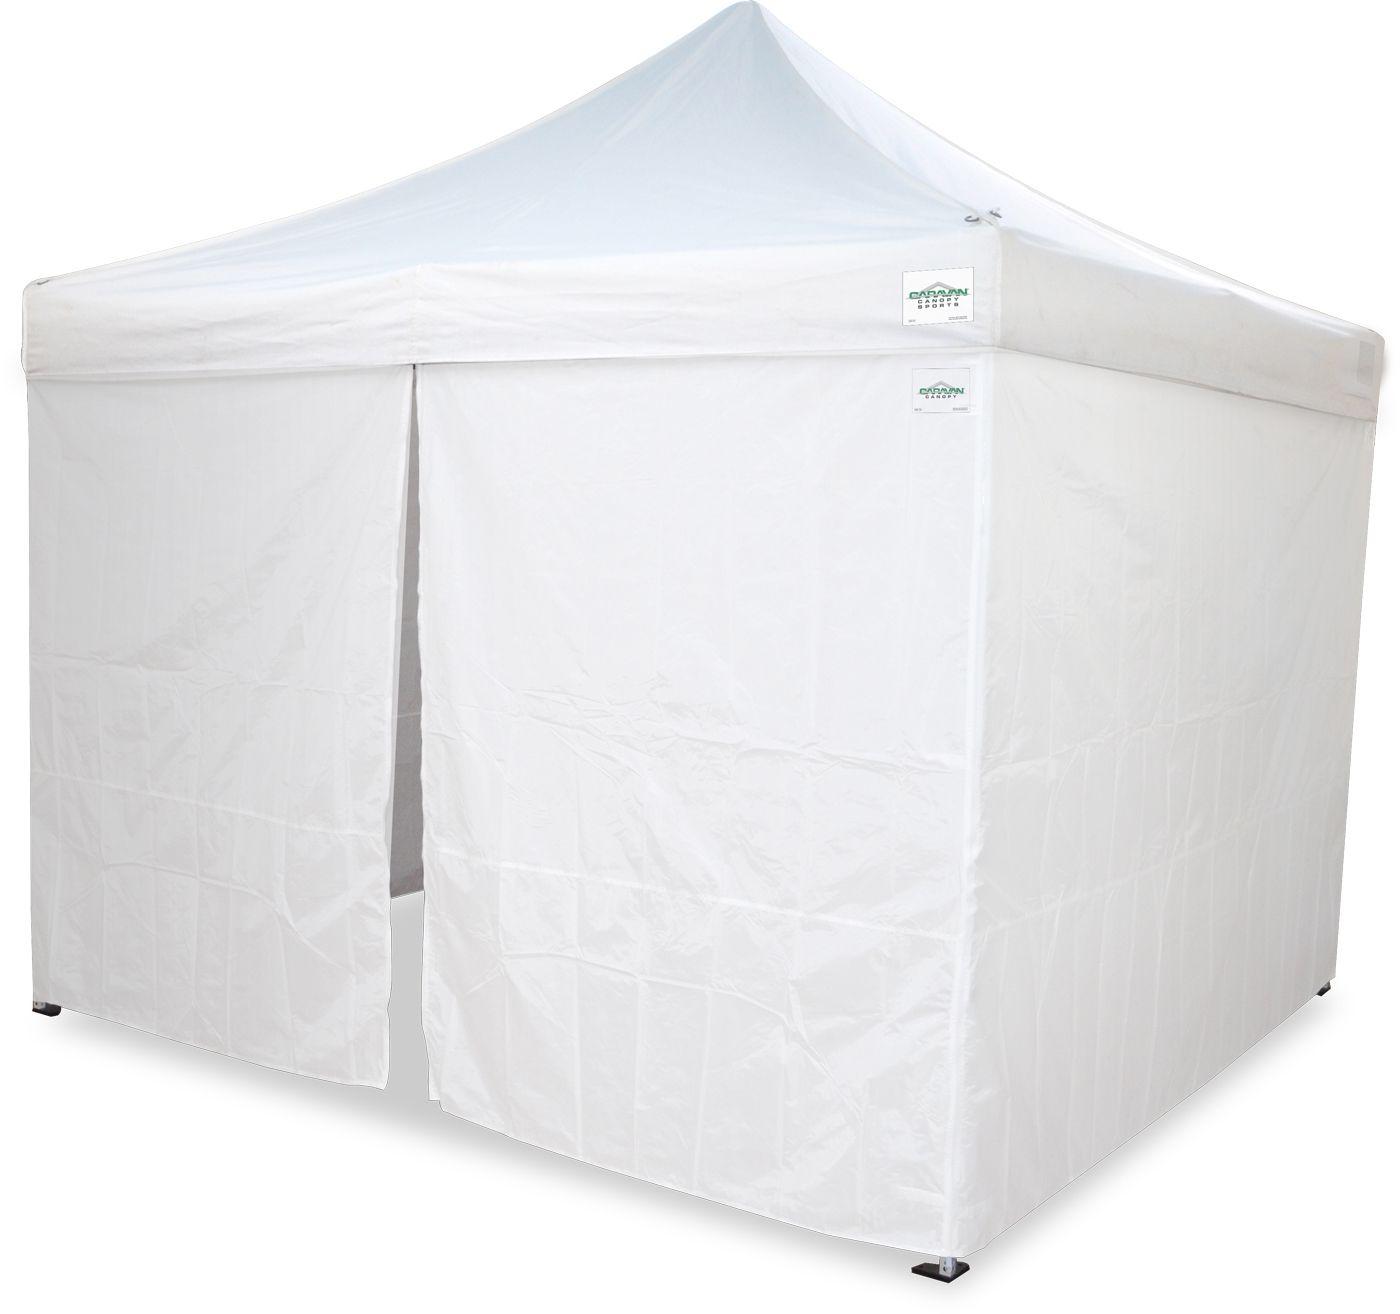 Caravan Canopy 12' x 12' M-Series 2 Pro Straight Leg Sidewalls